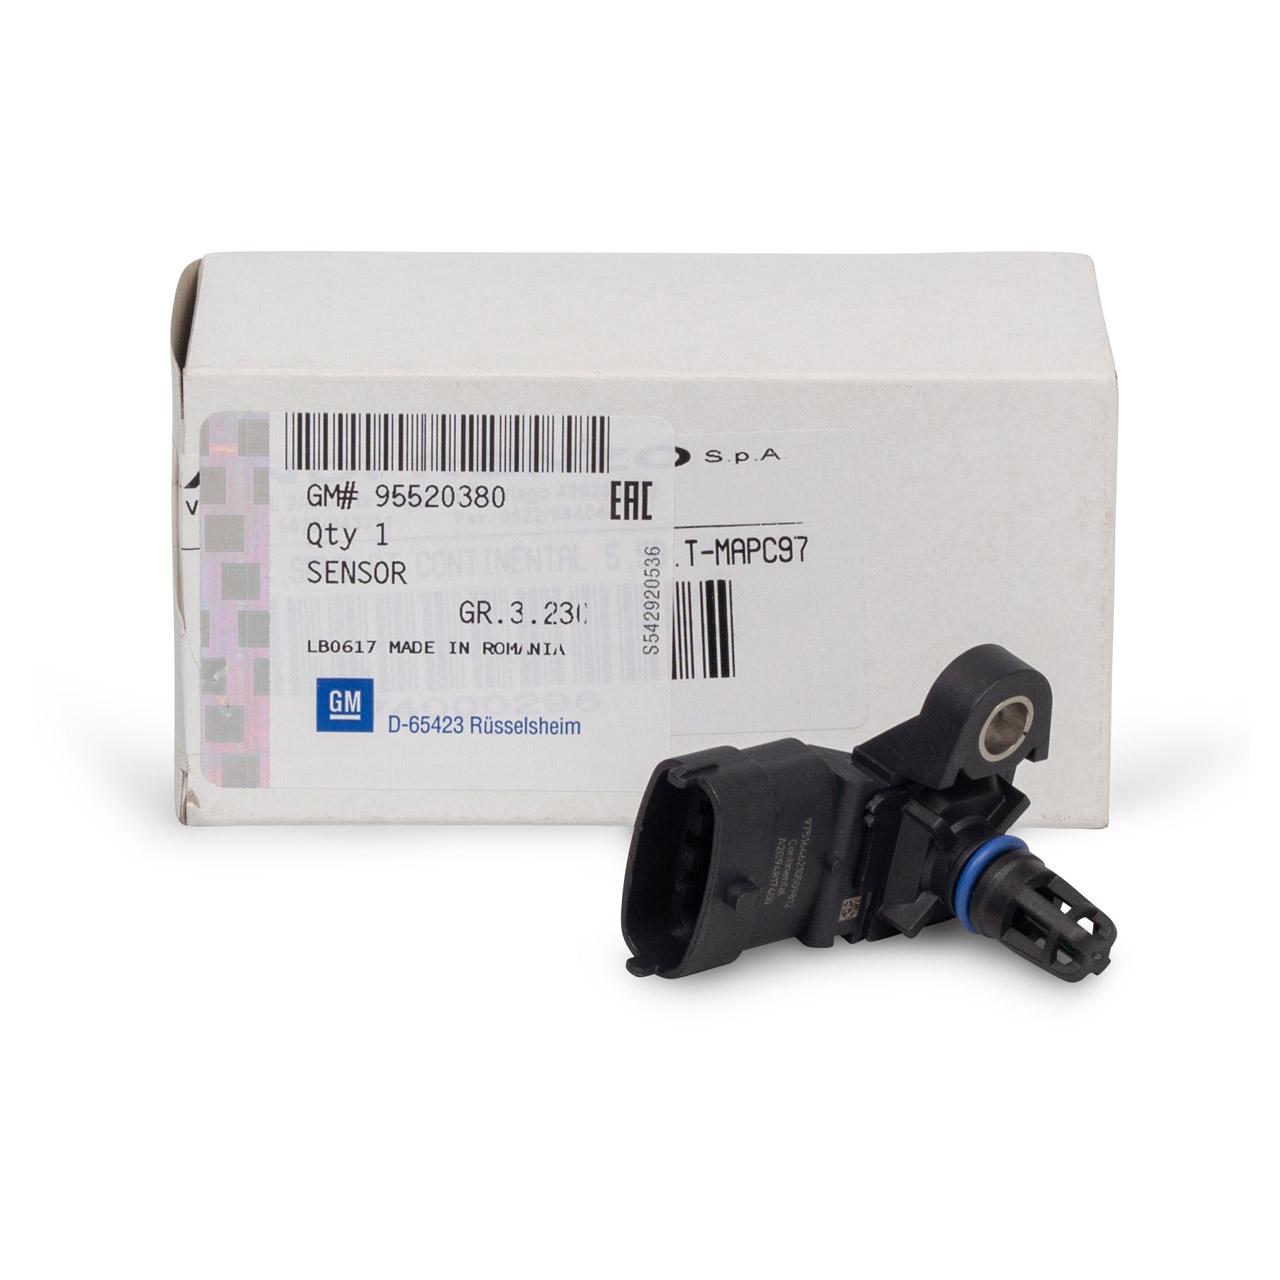 ORIGINAL Opel Sensor Kraftstoffdruck ASTRA J INSIGNIA A ZAFIRA C 1.4 95520380